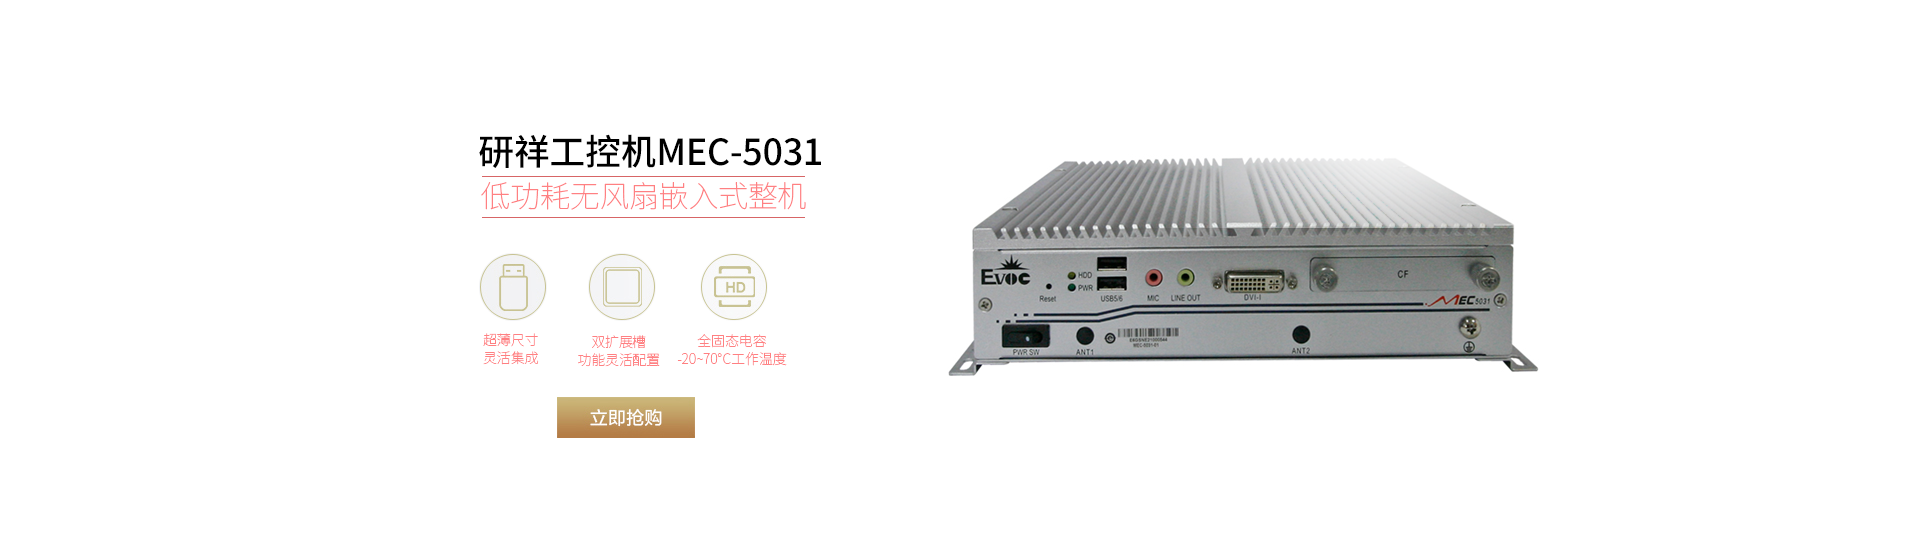 MEC-5031低功耗无风扇嵌入式整机,支持Intel四核处理器